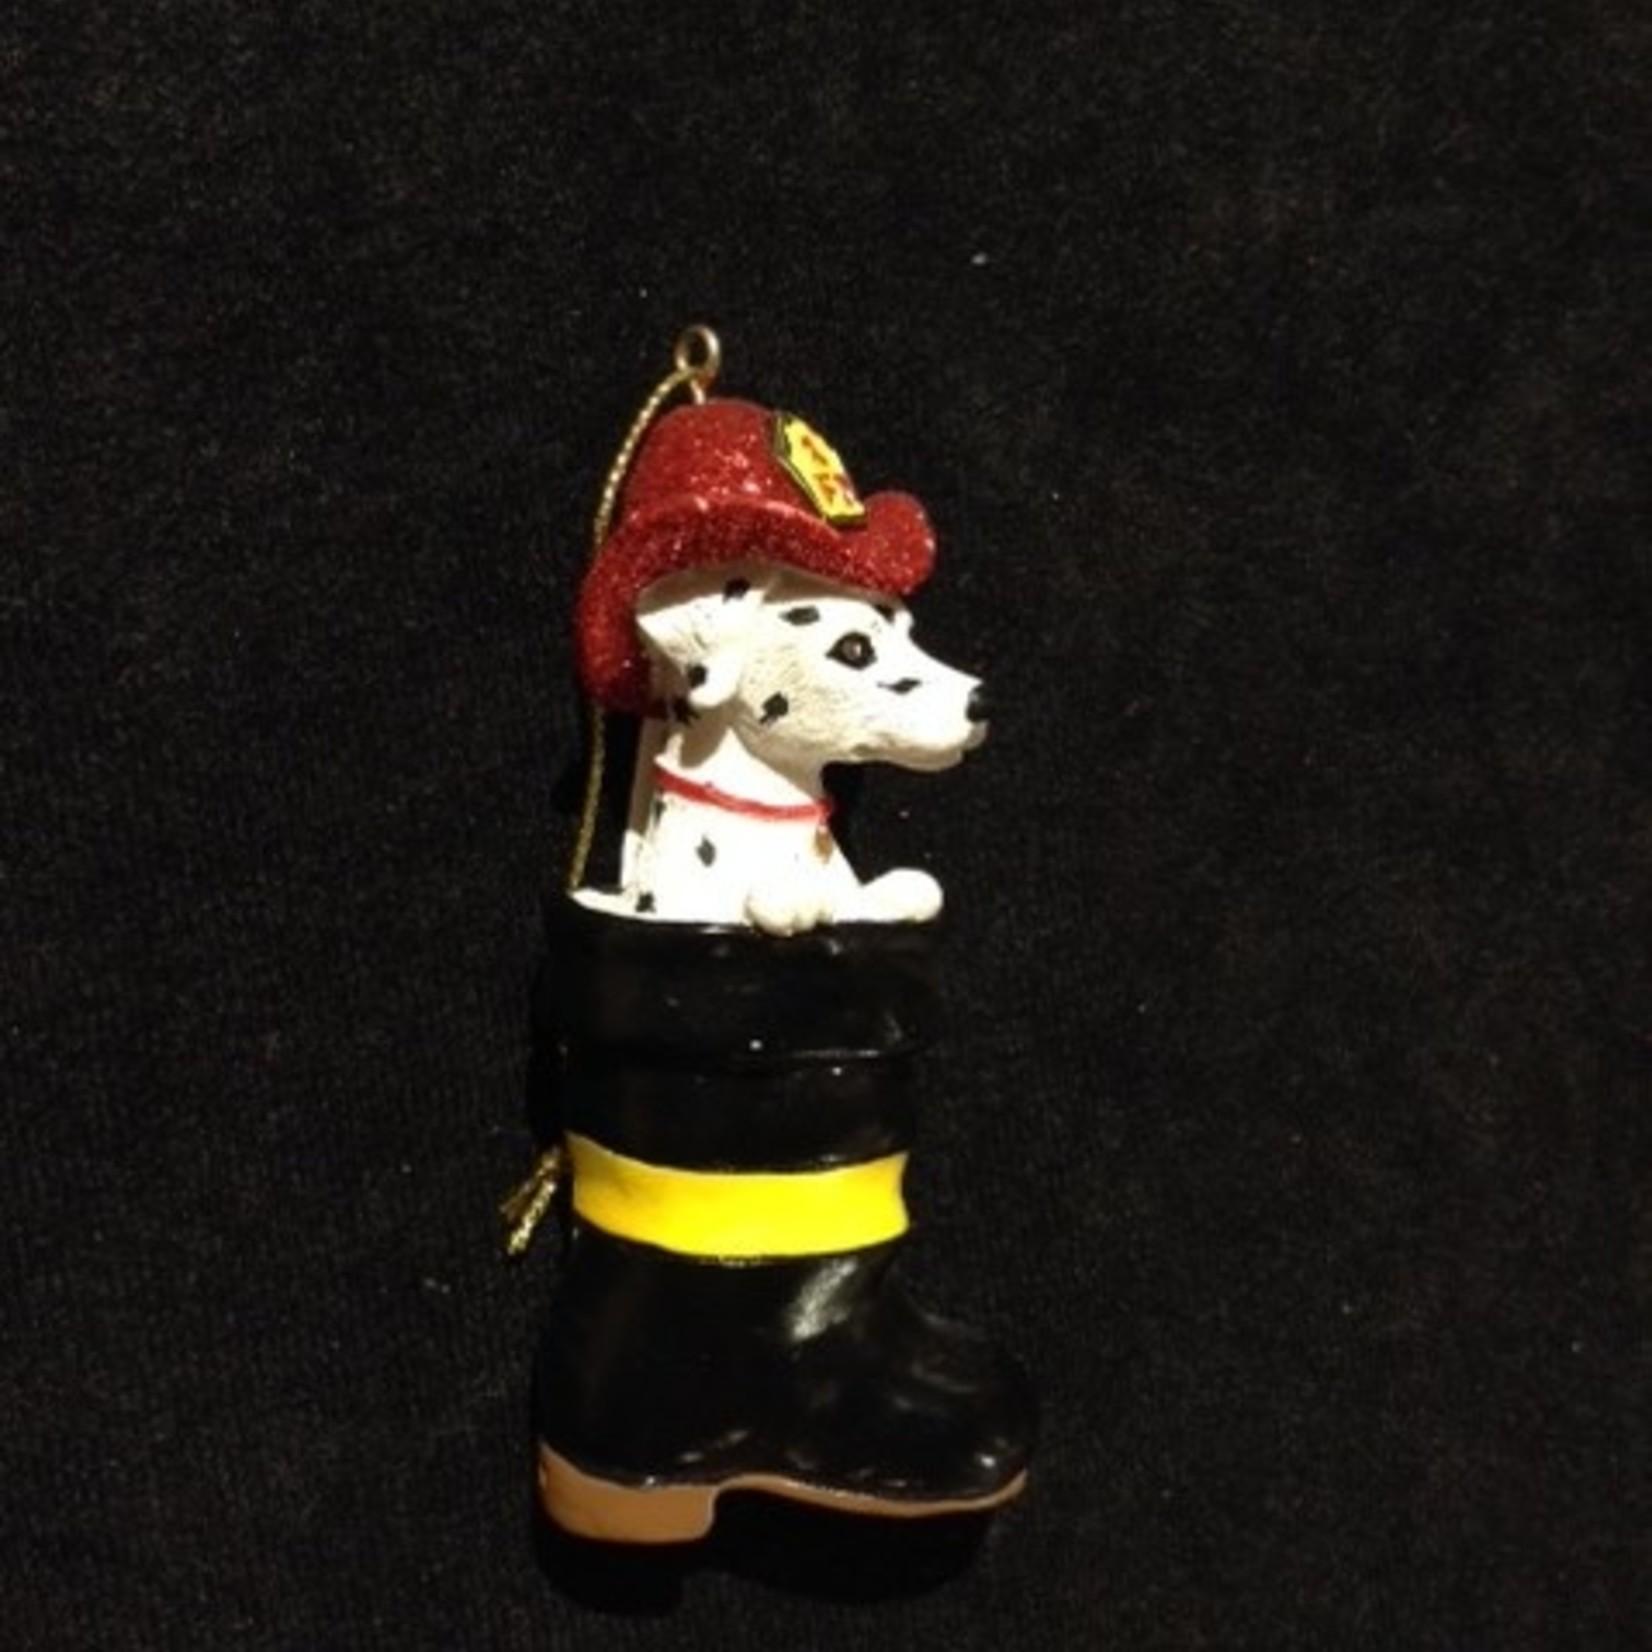 Fireman Dalmation Ornament 2A